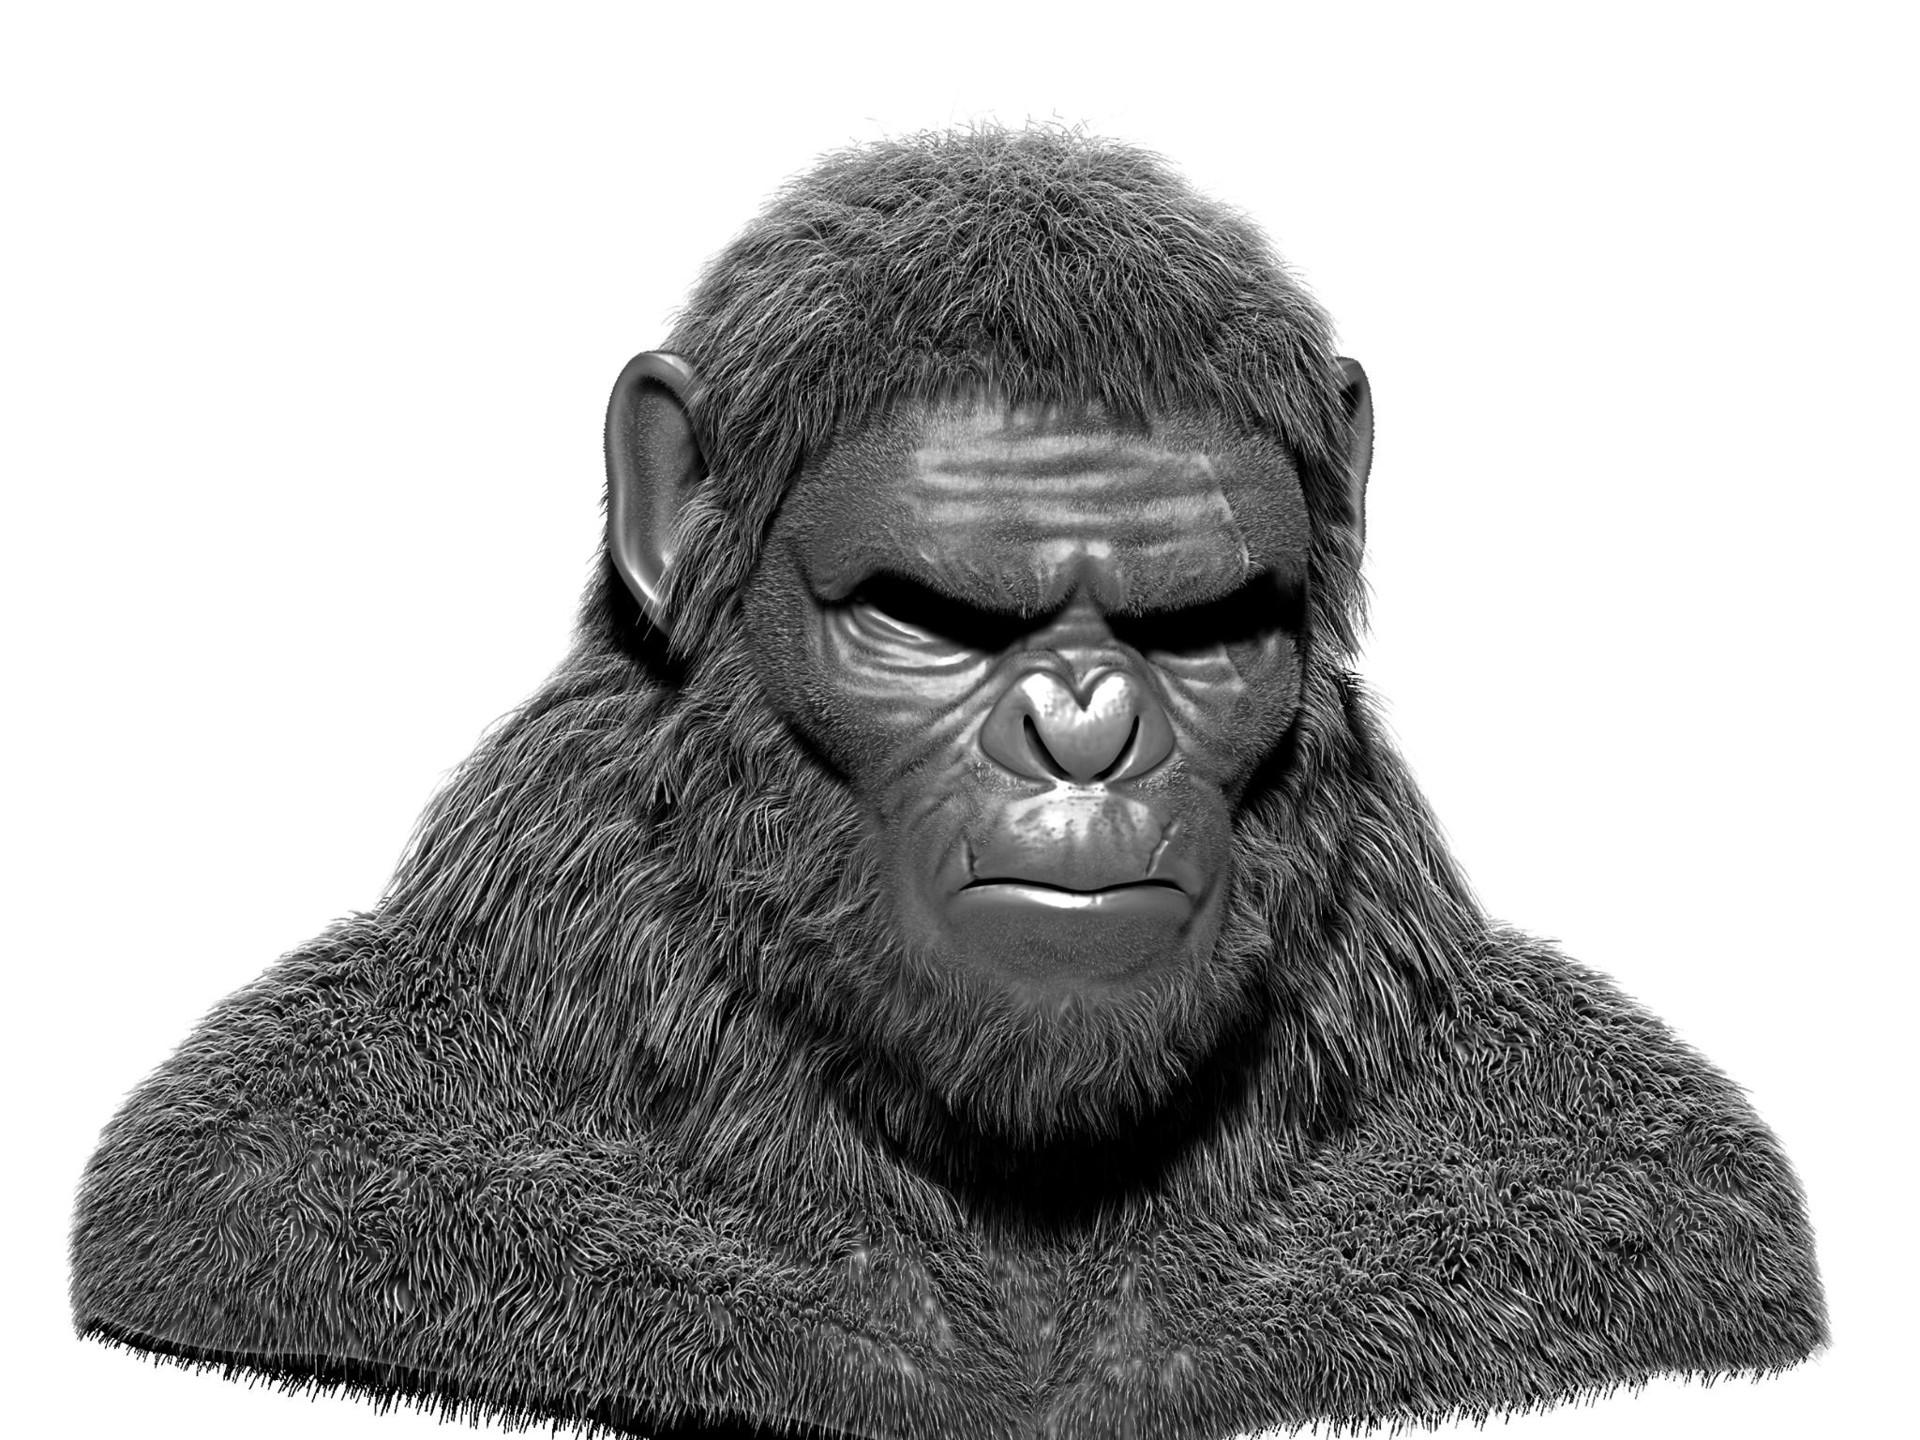 Artstation Koba War For The Planet Of The Apes Black Star